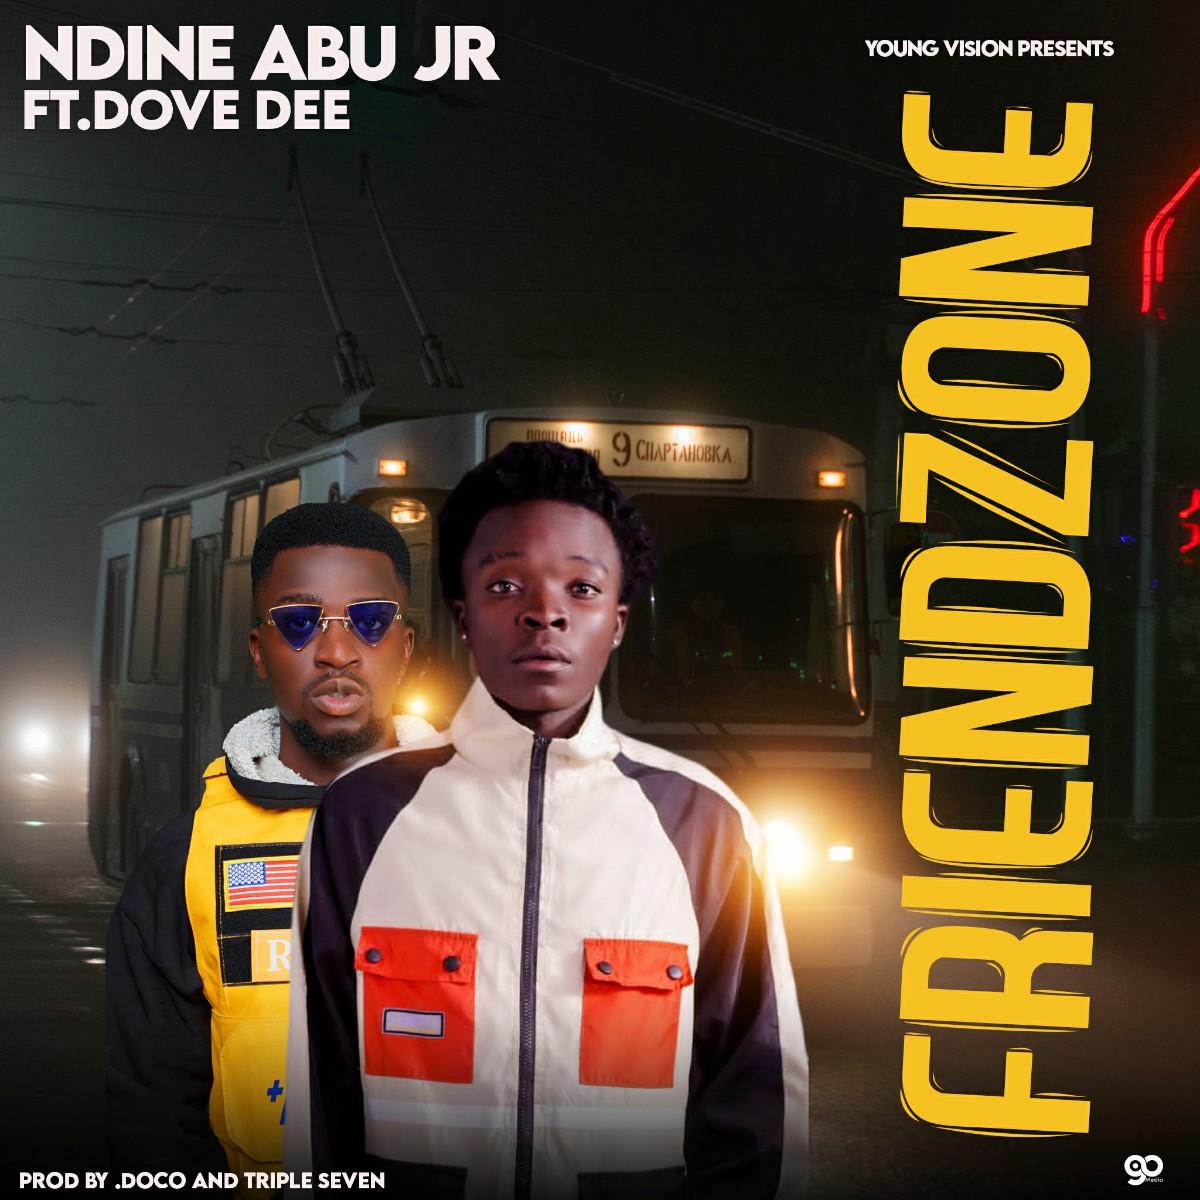 Ndine Abu Jr ft. Dove Dee - Friend Zone